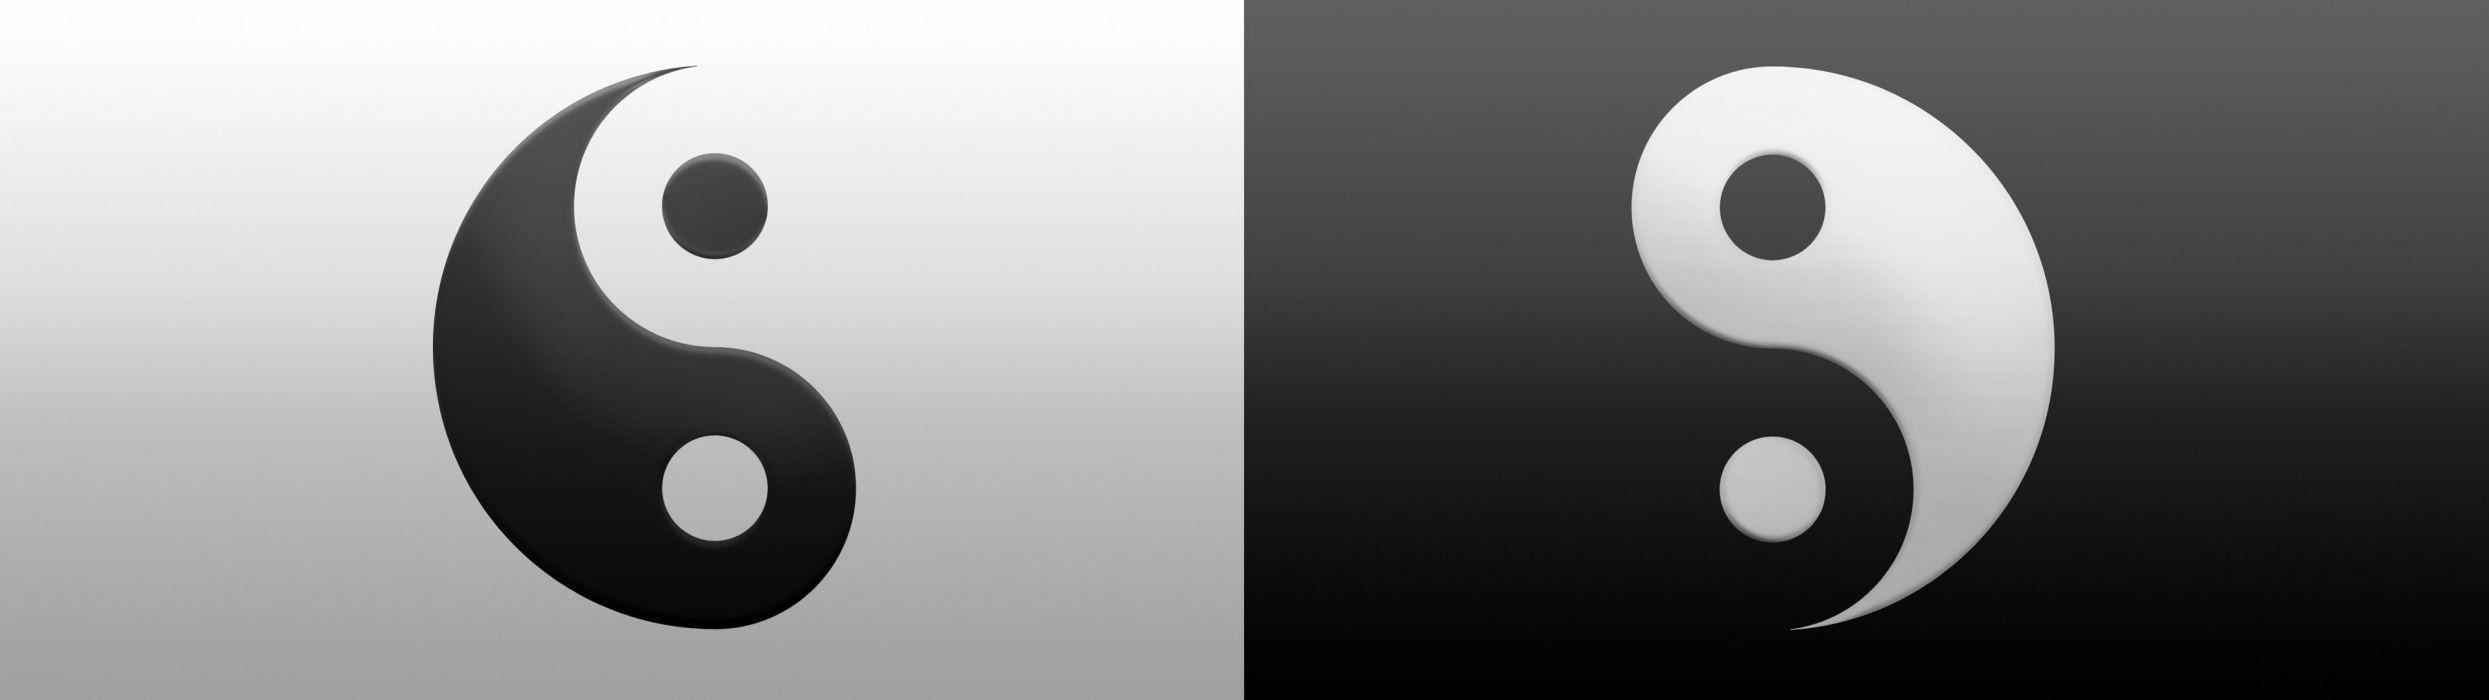 dual monitor screen multi multiple ying yang equilibre A wallpaper